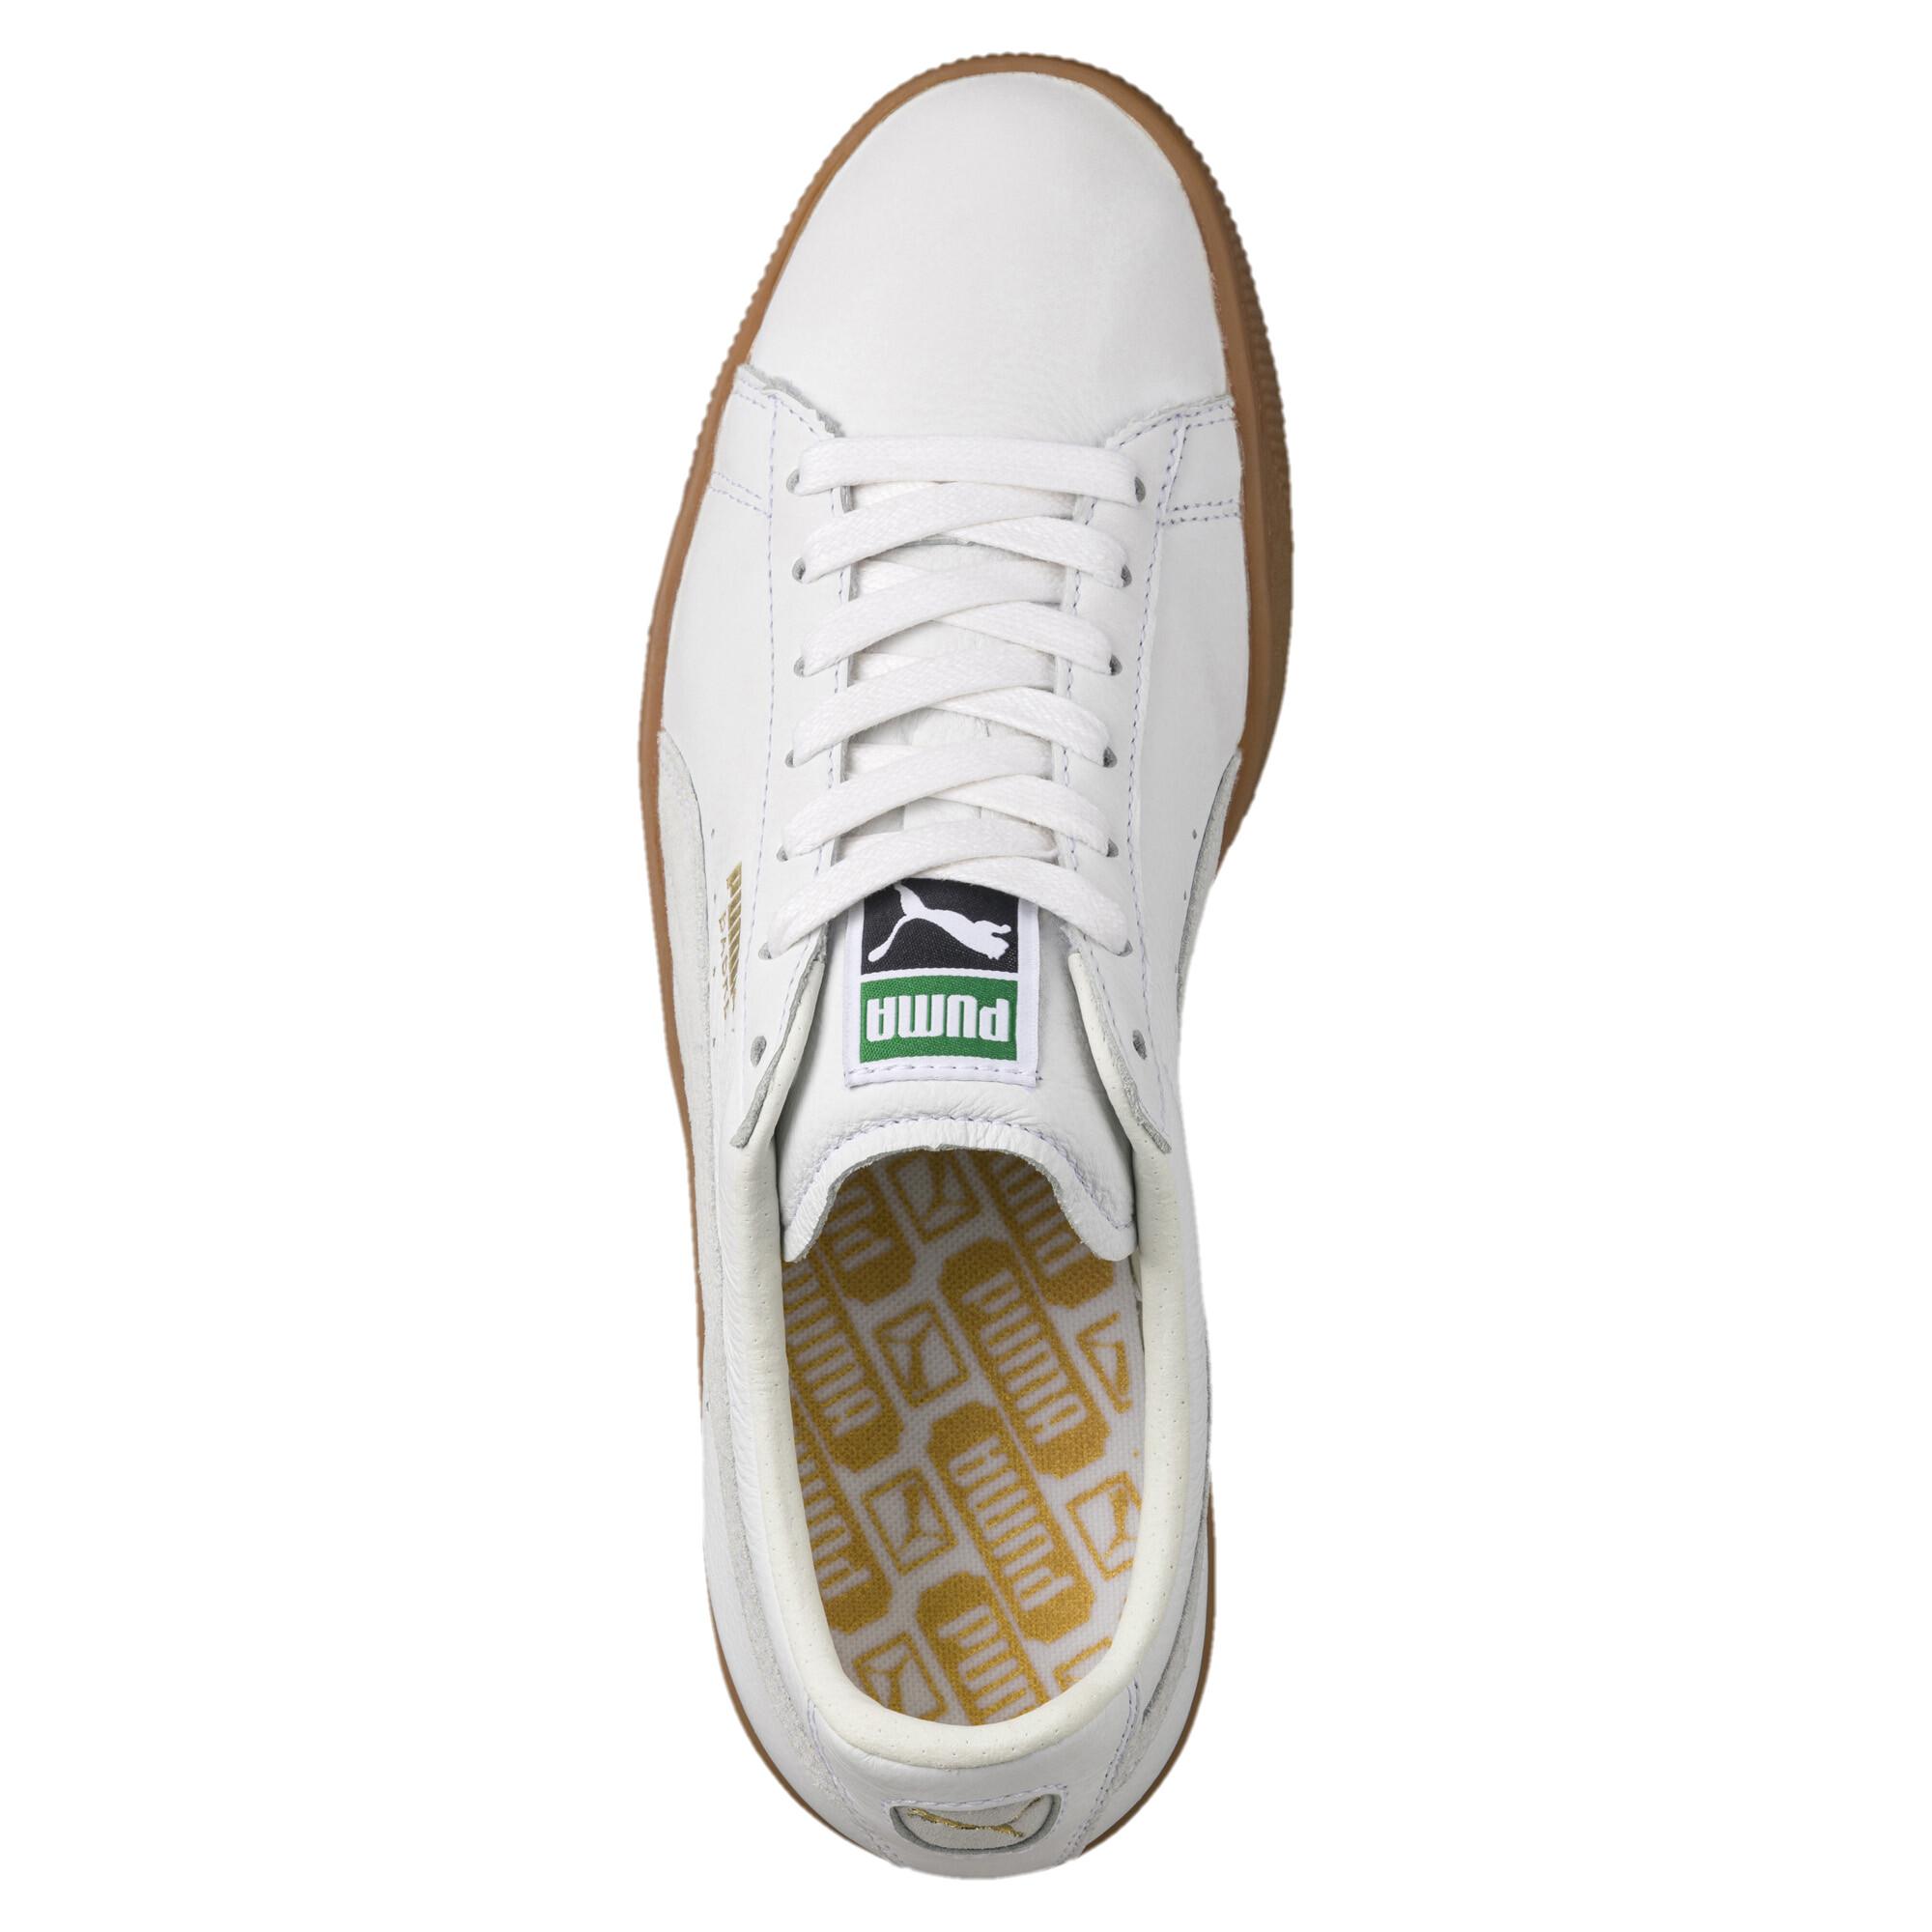 Image Puma Men's Basket Classic Gum Deluxe Sneakers #5